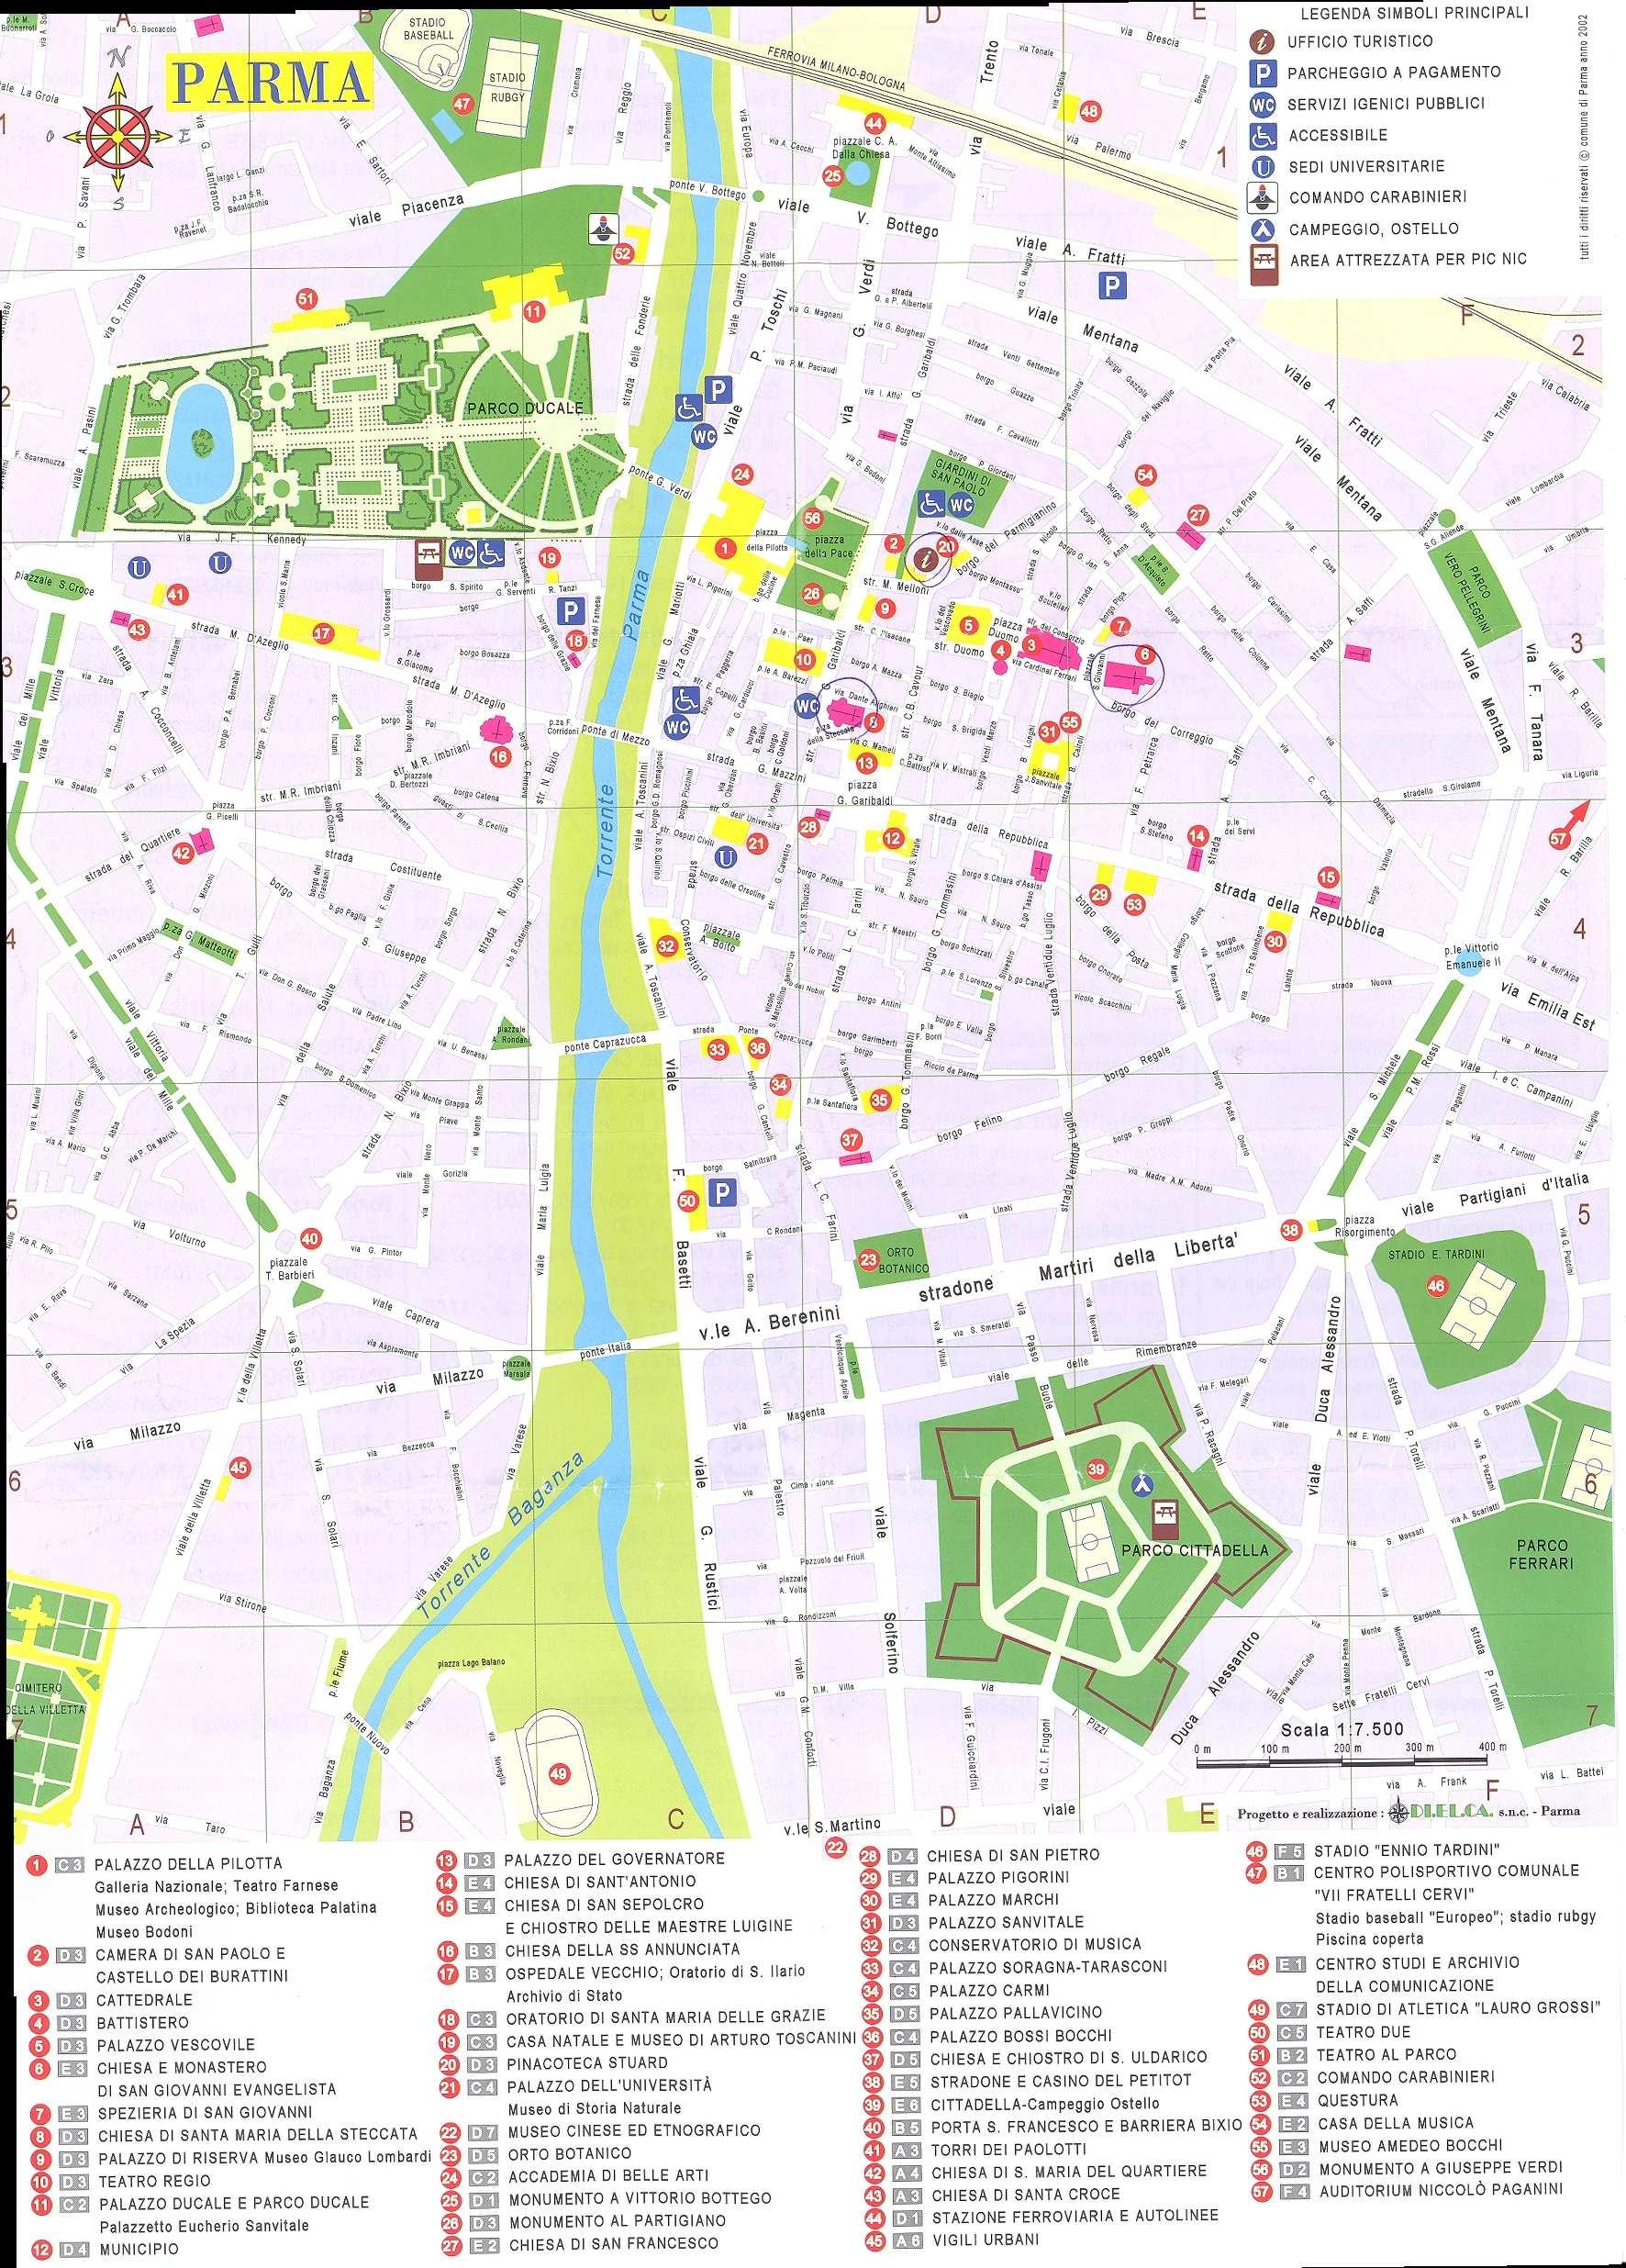 parma italy map